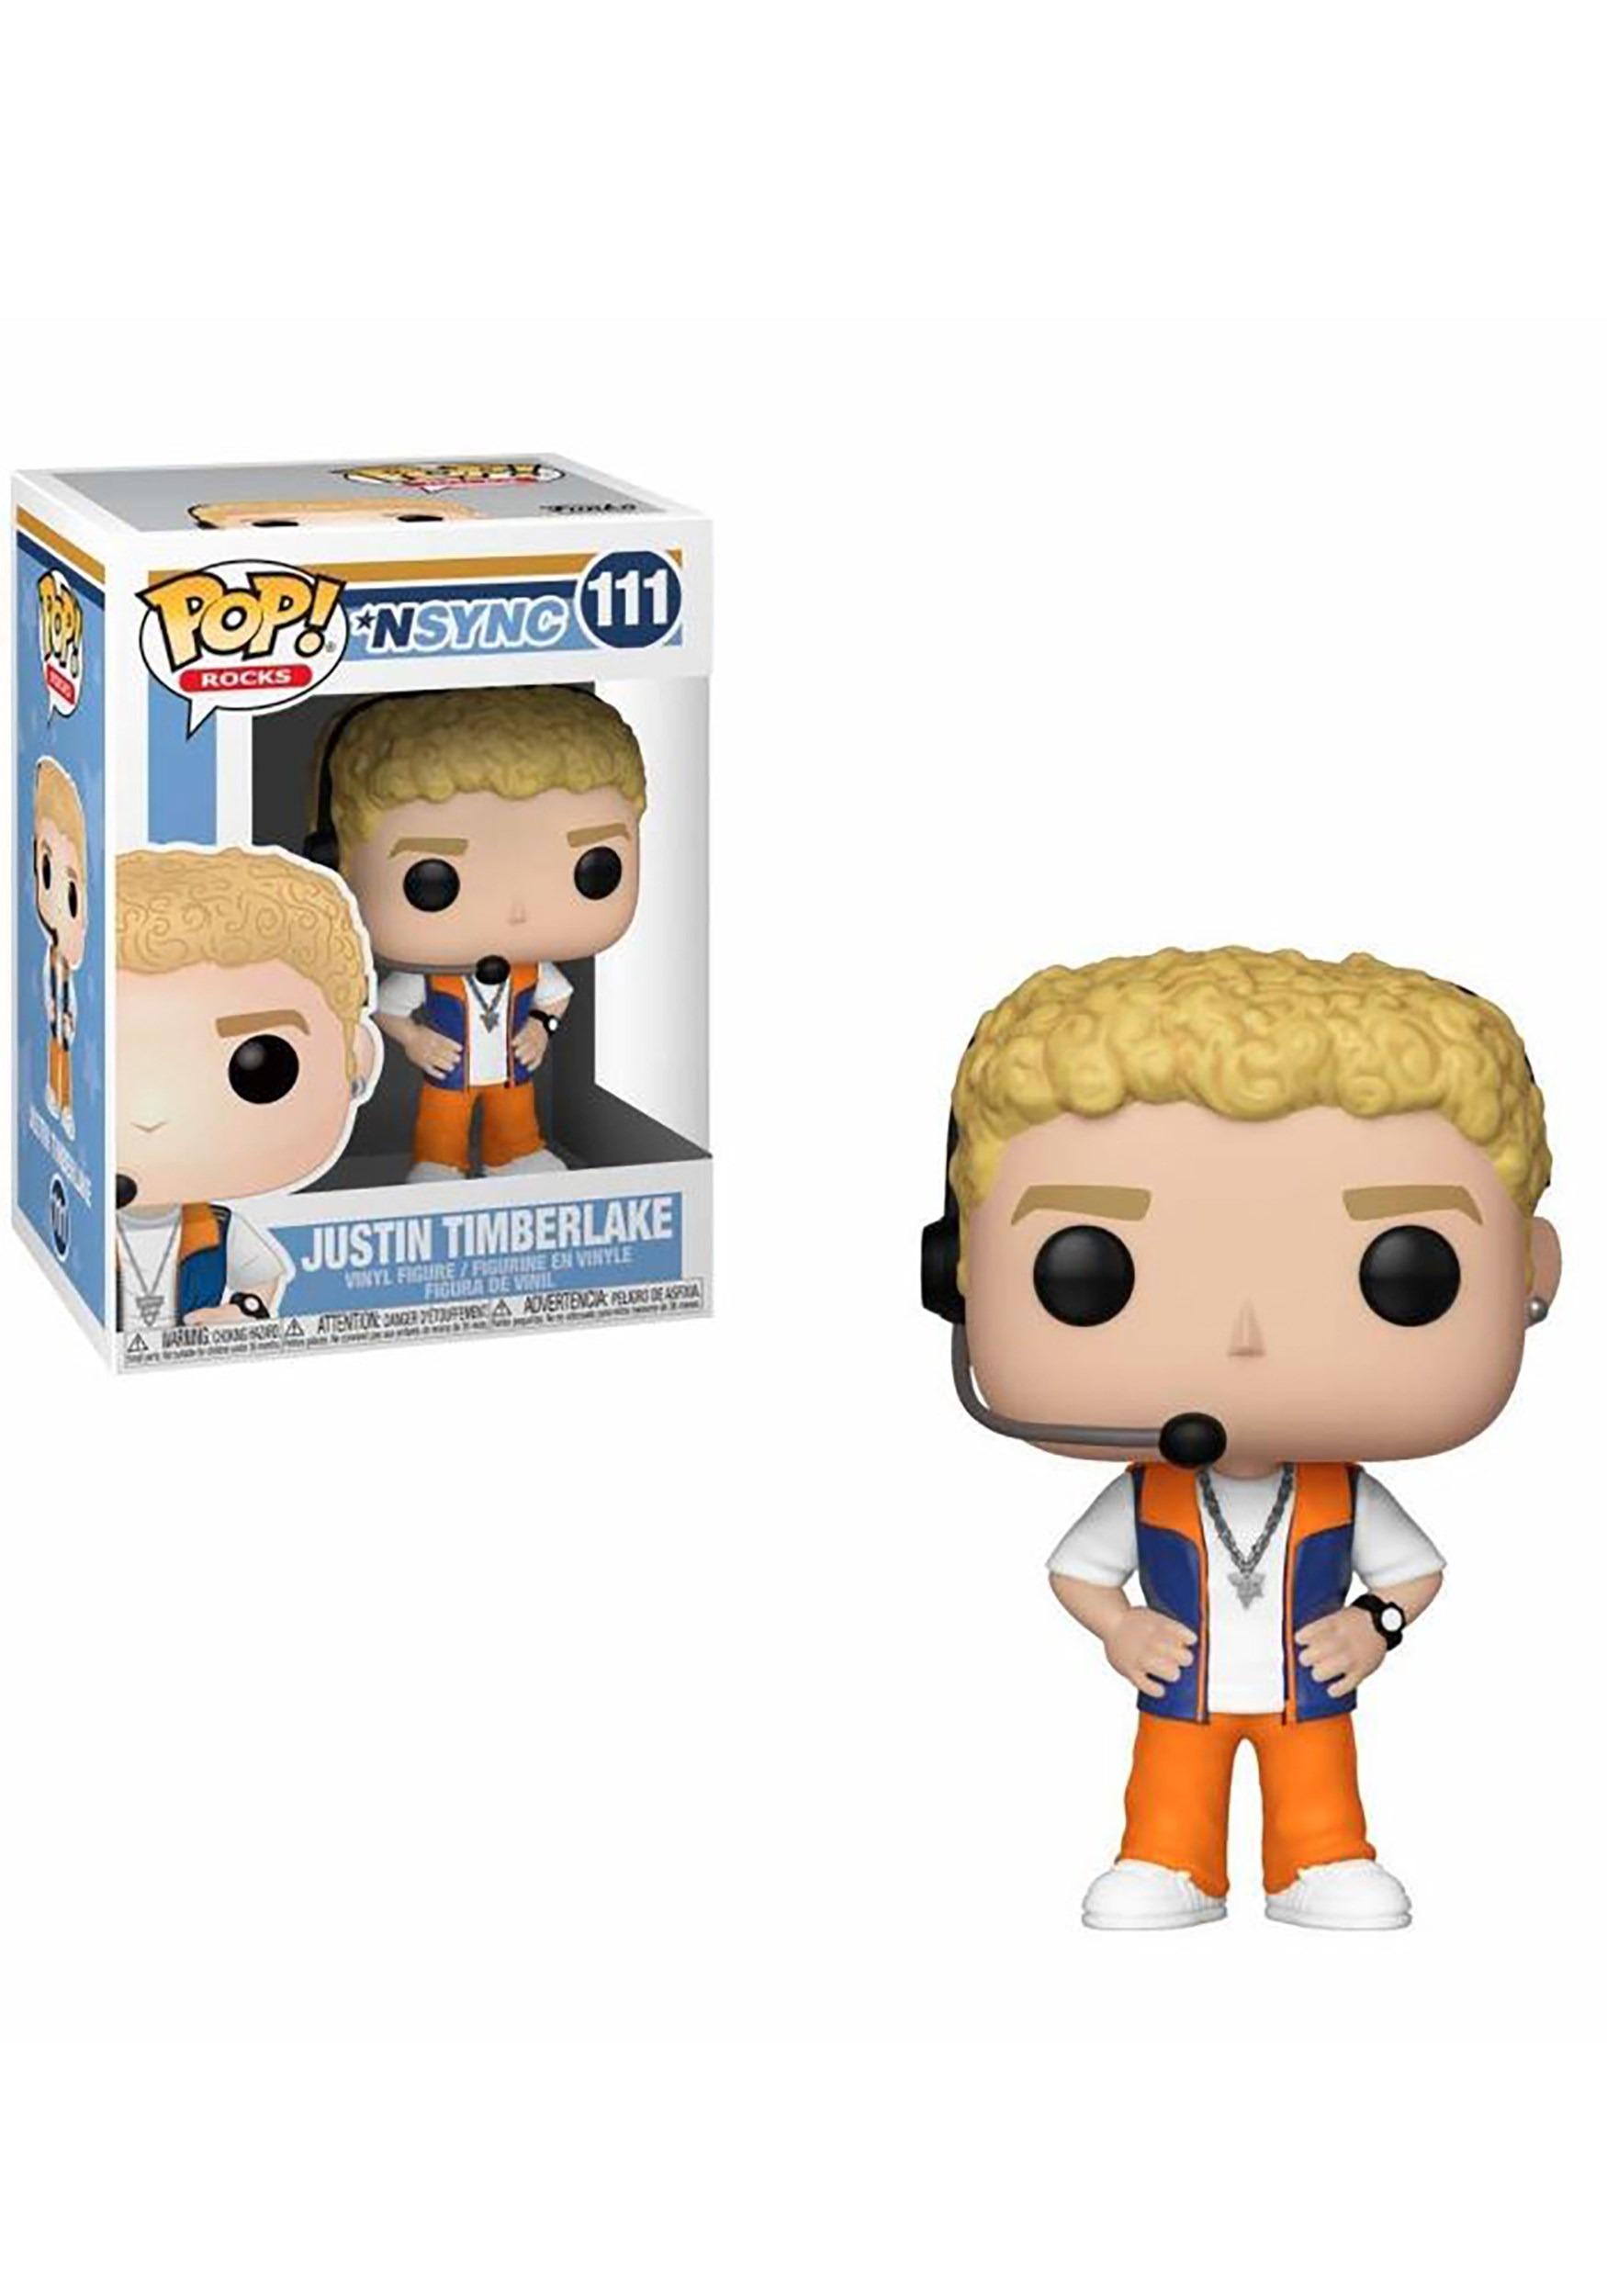 Pop! Rocks: NSYNC- Justin Timberlake Figure